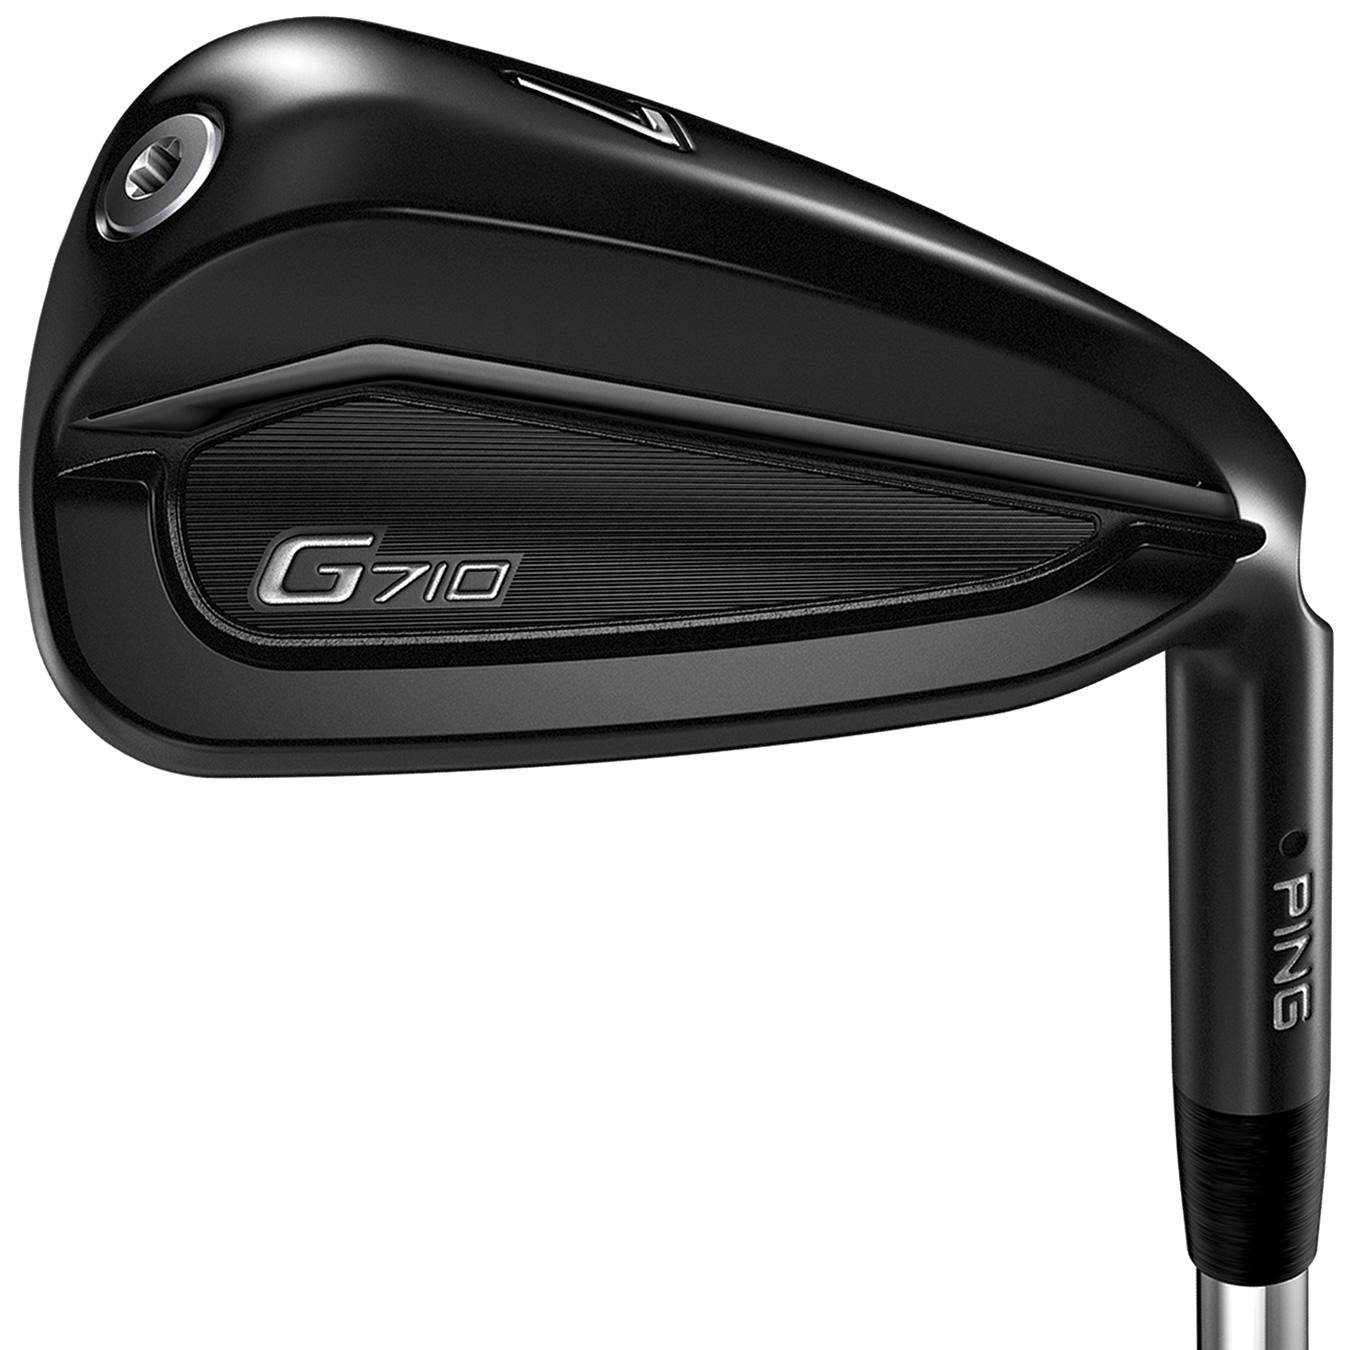 Ping G710 Golf Irons Graphite